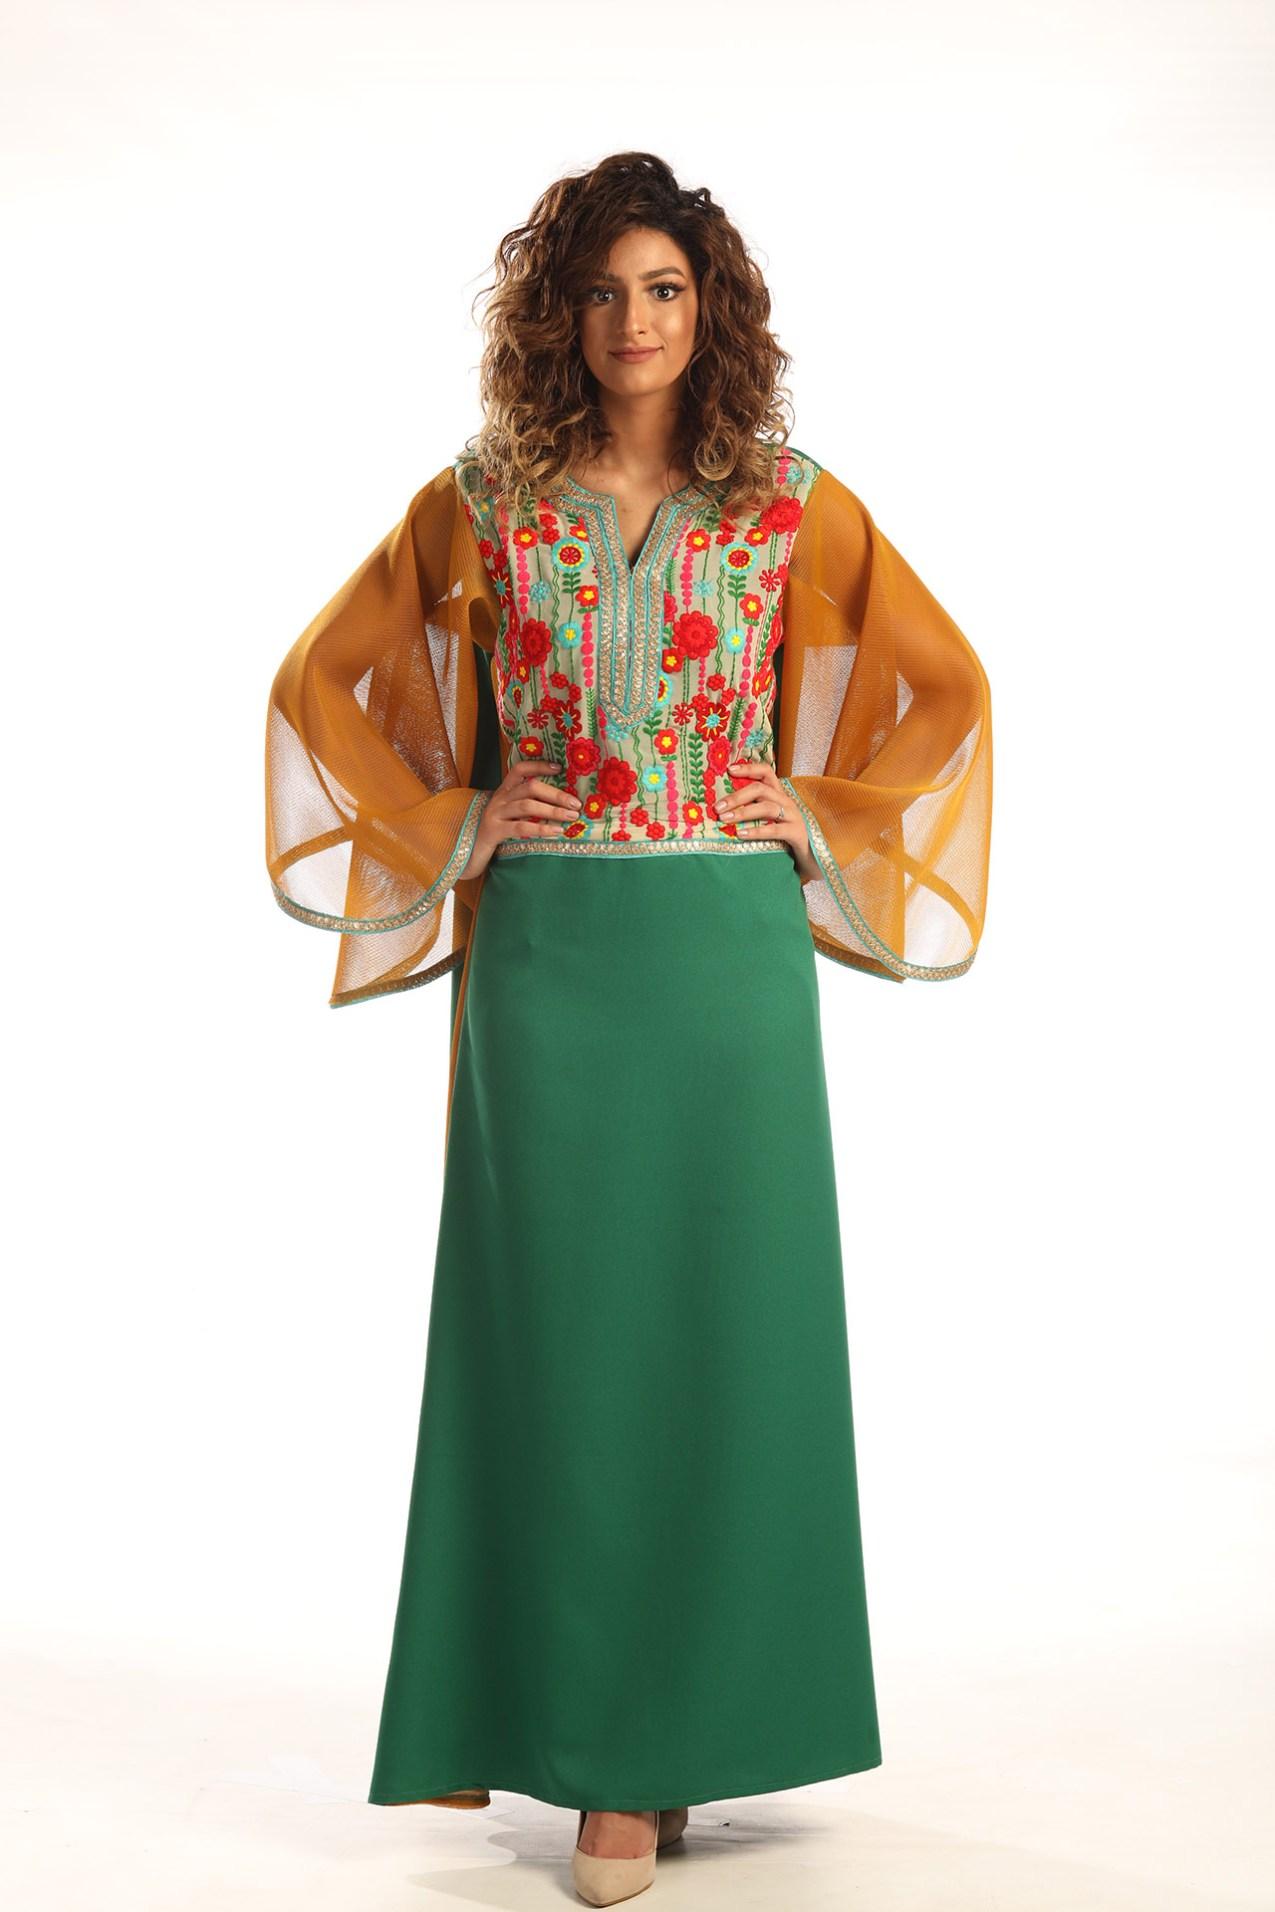 873c065bf6739 Long Green Dress with Wide Sleeves – متجر خود للأزياء – أناقة بلا ...